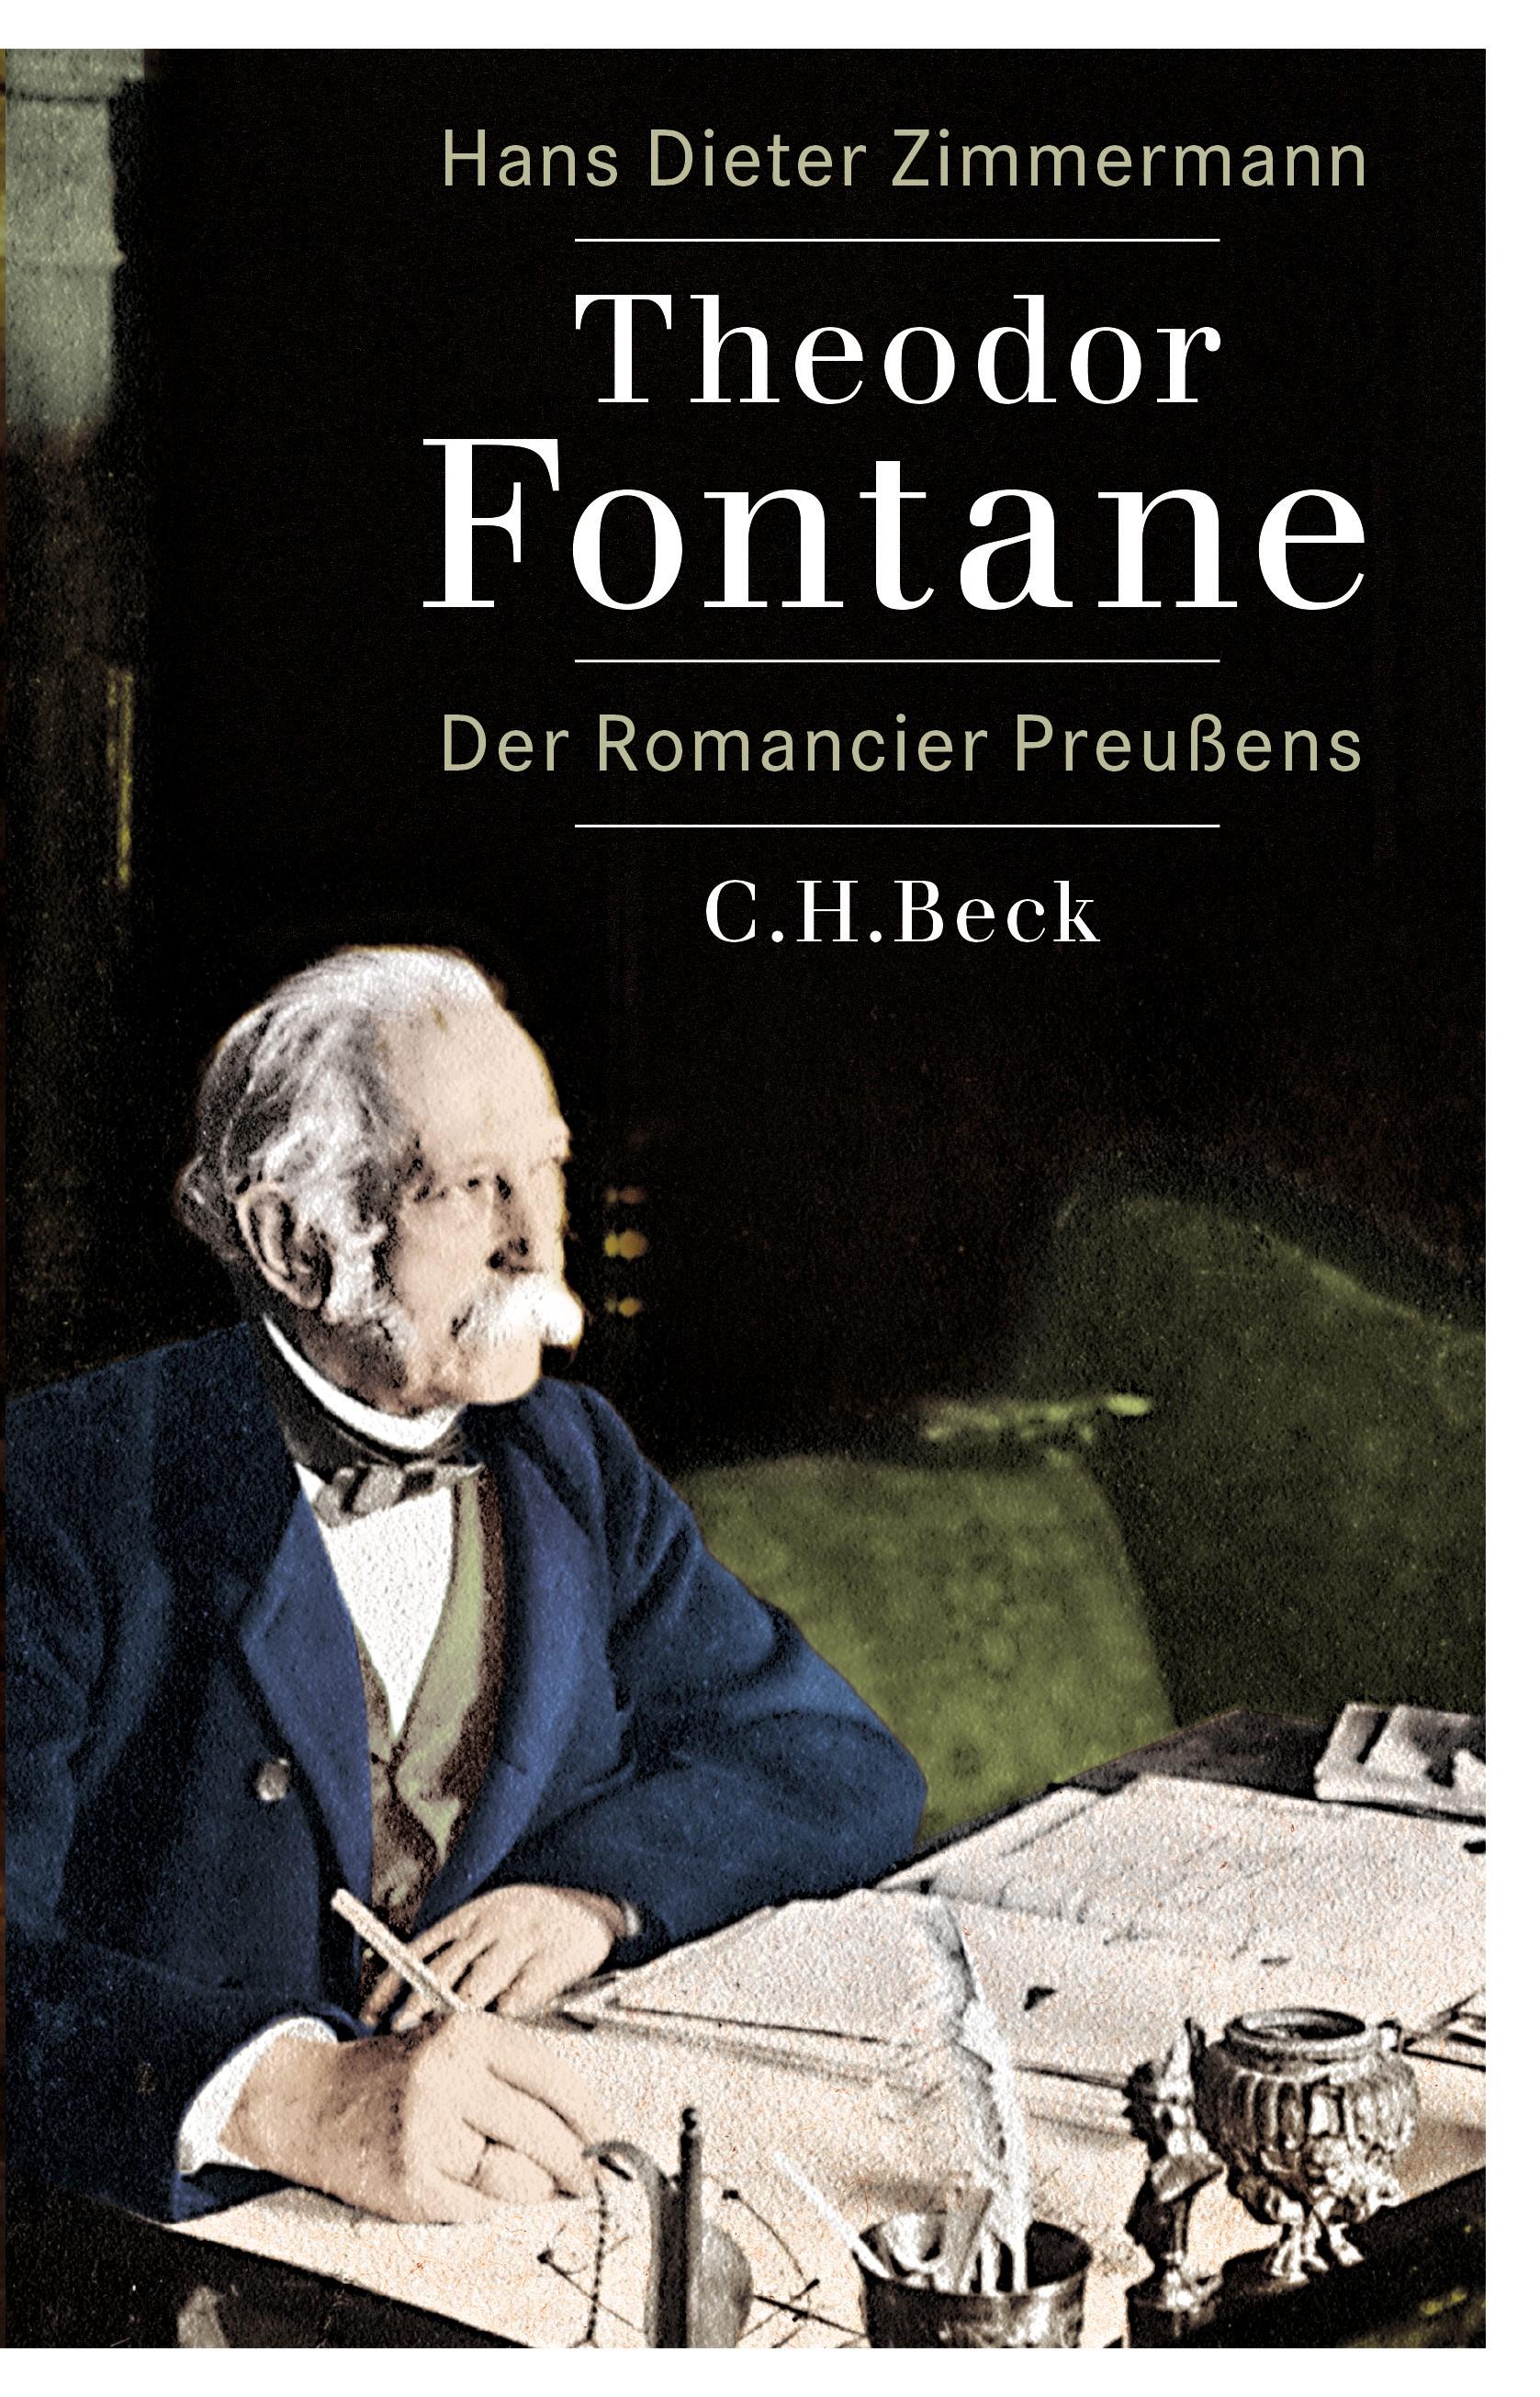 Theodor Fontane | Zimmermann, Hans Dieter, 2019 | Buch (Cover)